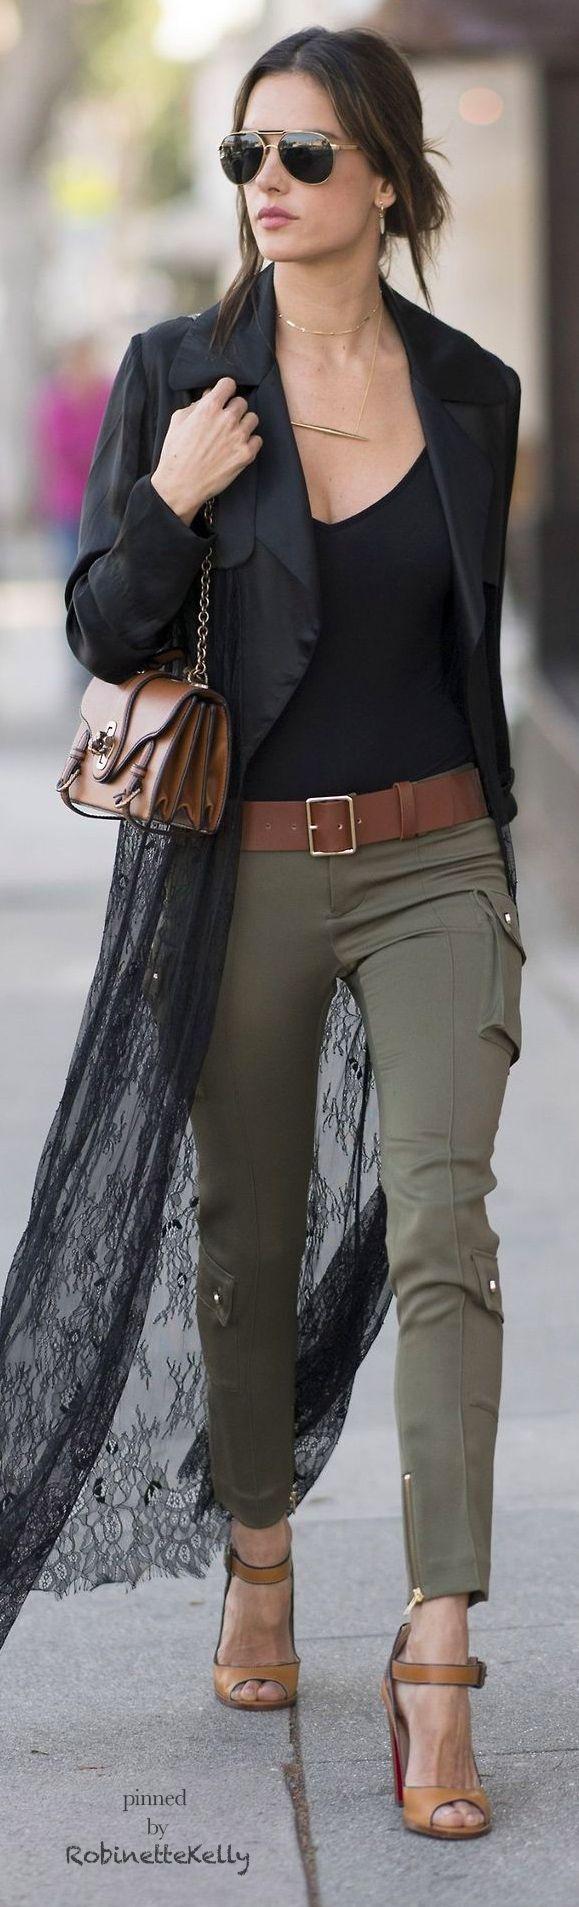 Alessandra Ambrosio | Street Style